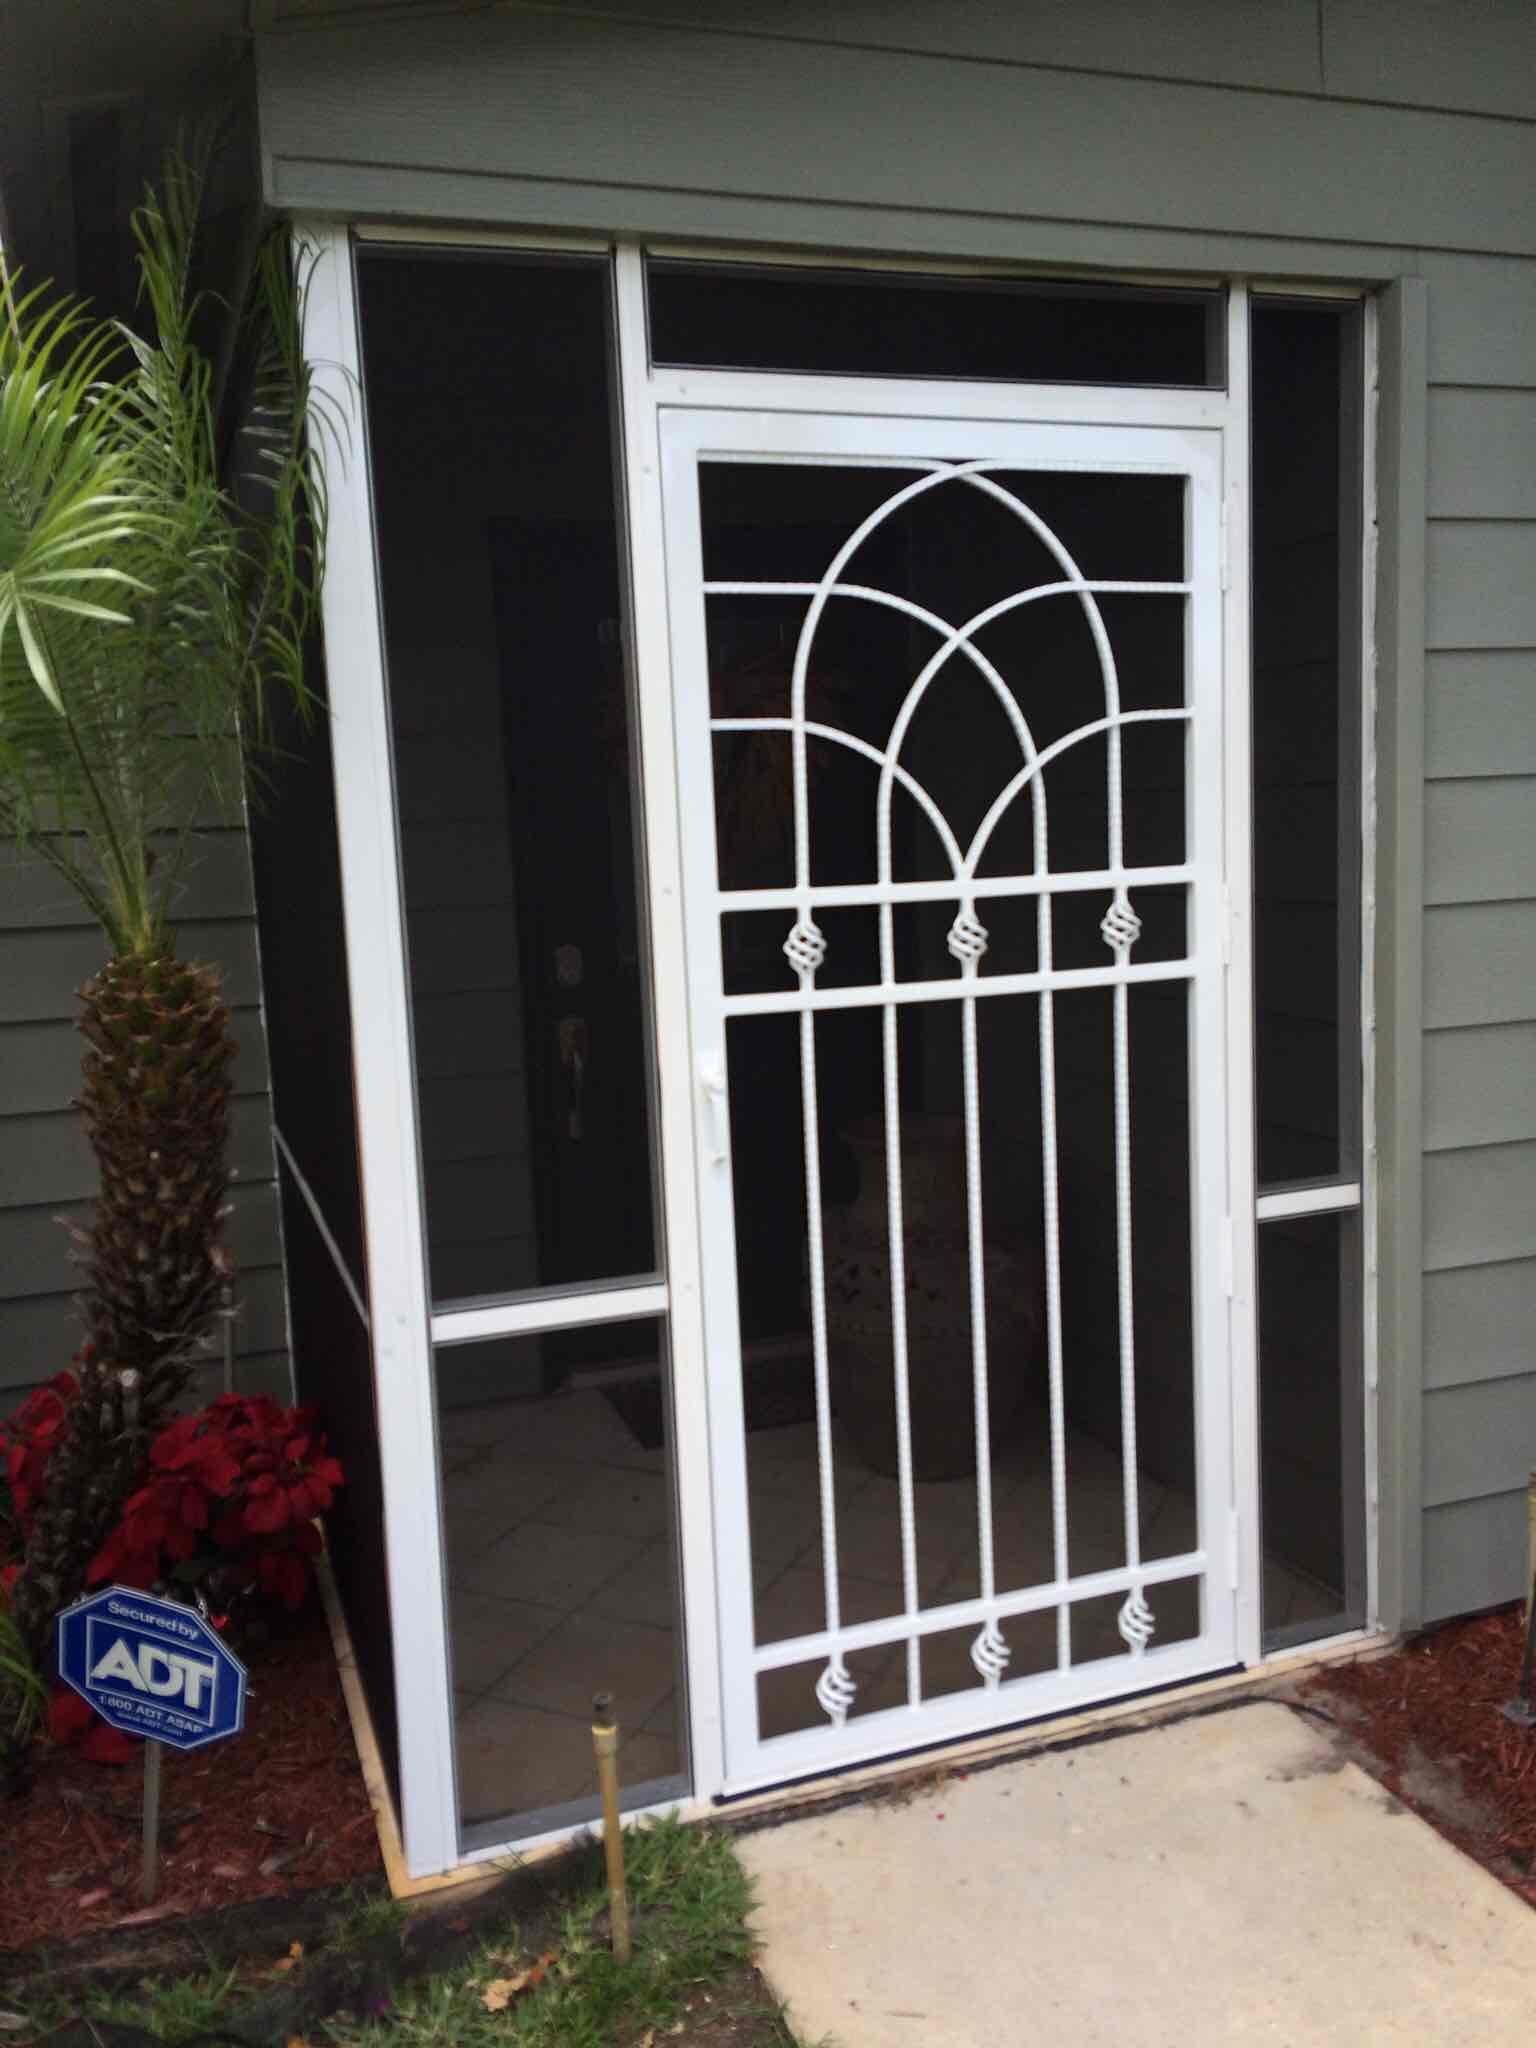 Adda screen inc lake worth fl 33467 angies list for Garage door repair lake worth fl